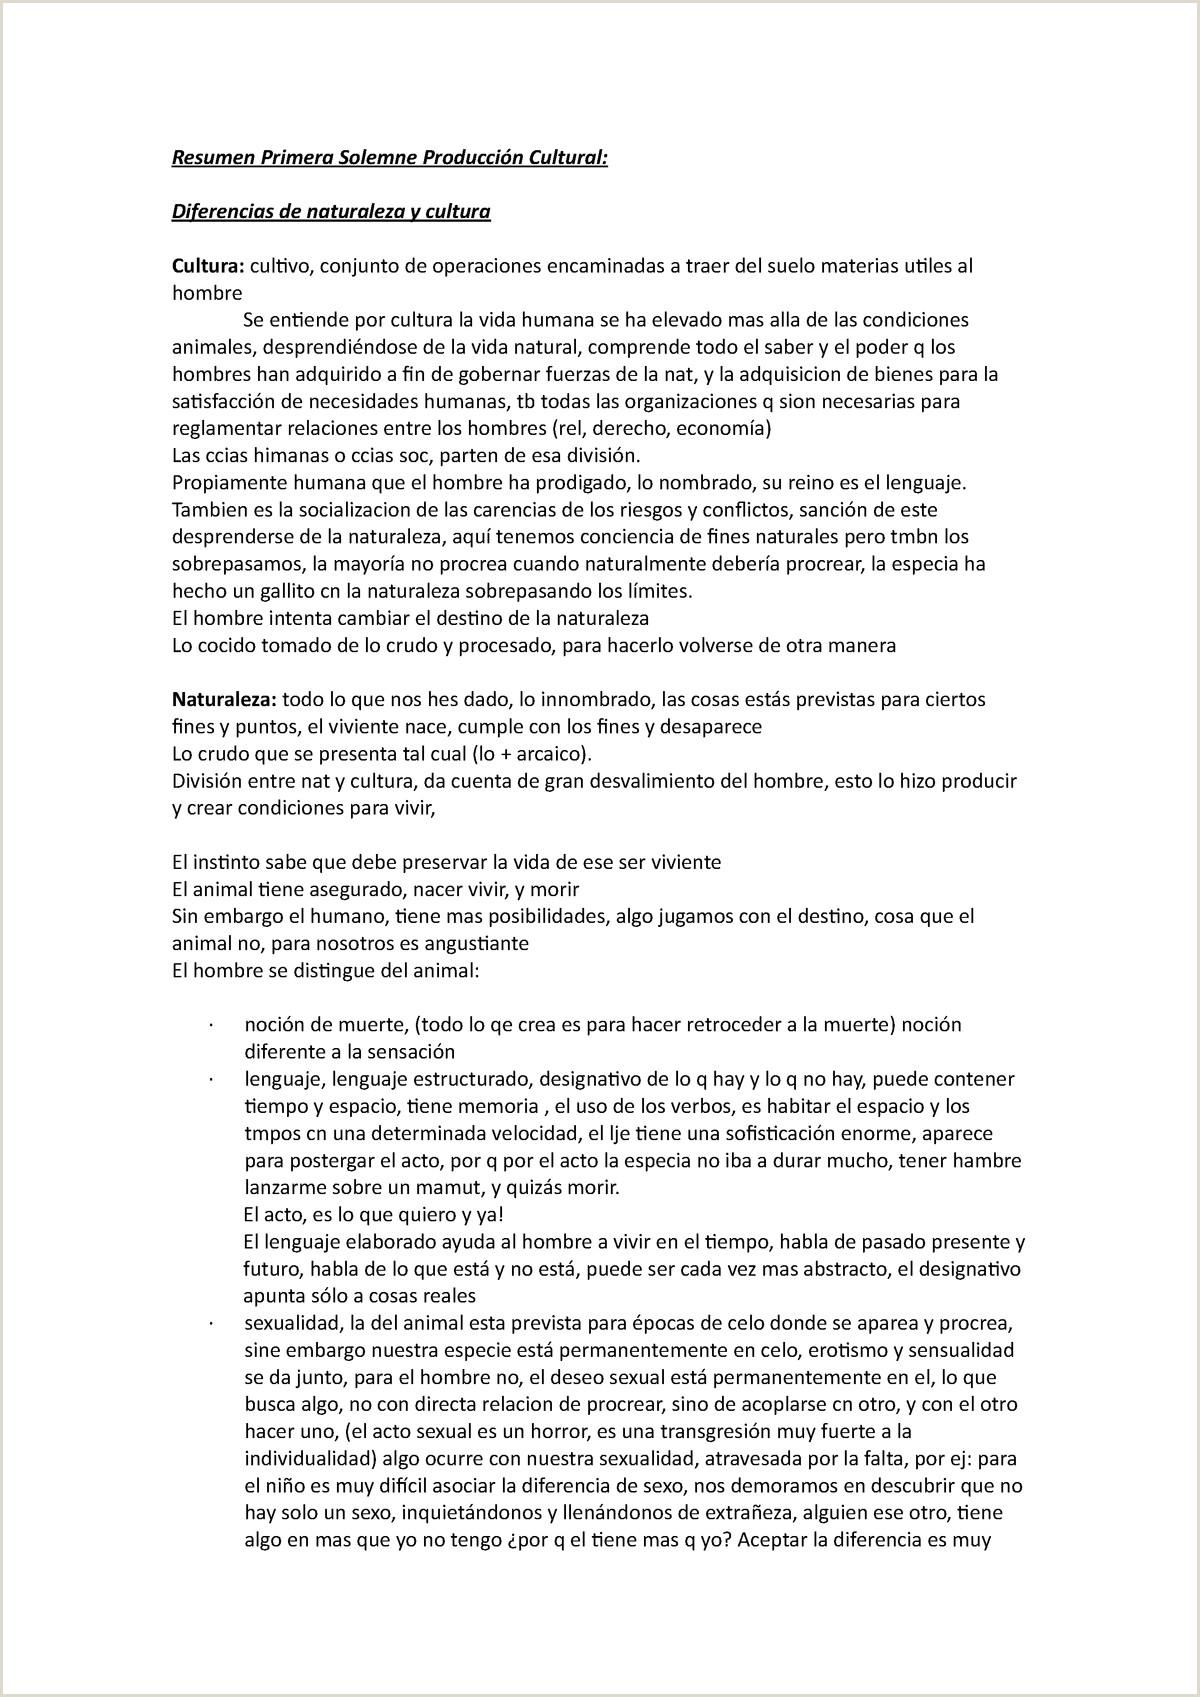 Hoja De Vida Minerva Llena Producion Cultural Materia solemne 1y 2c Psicologa